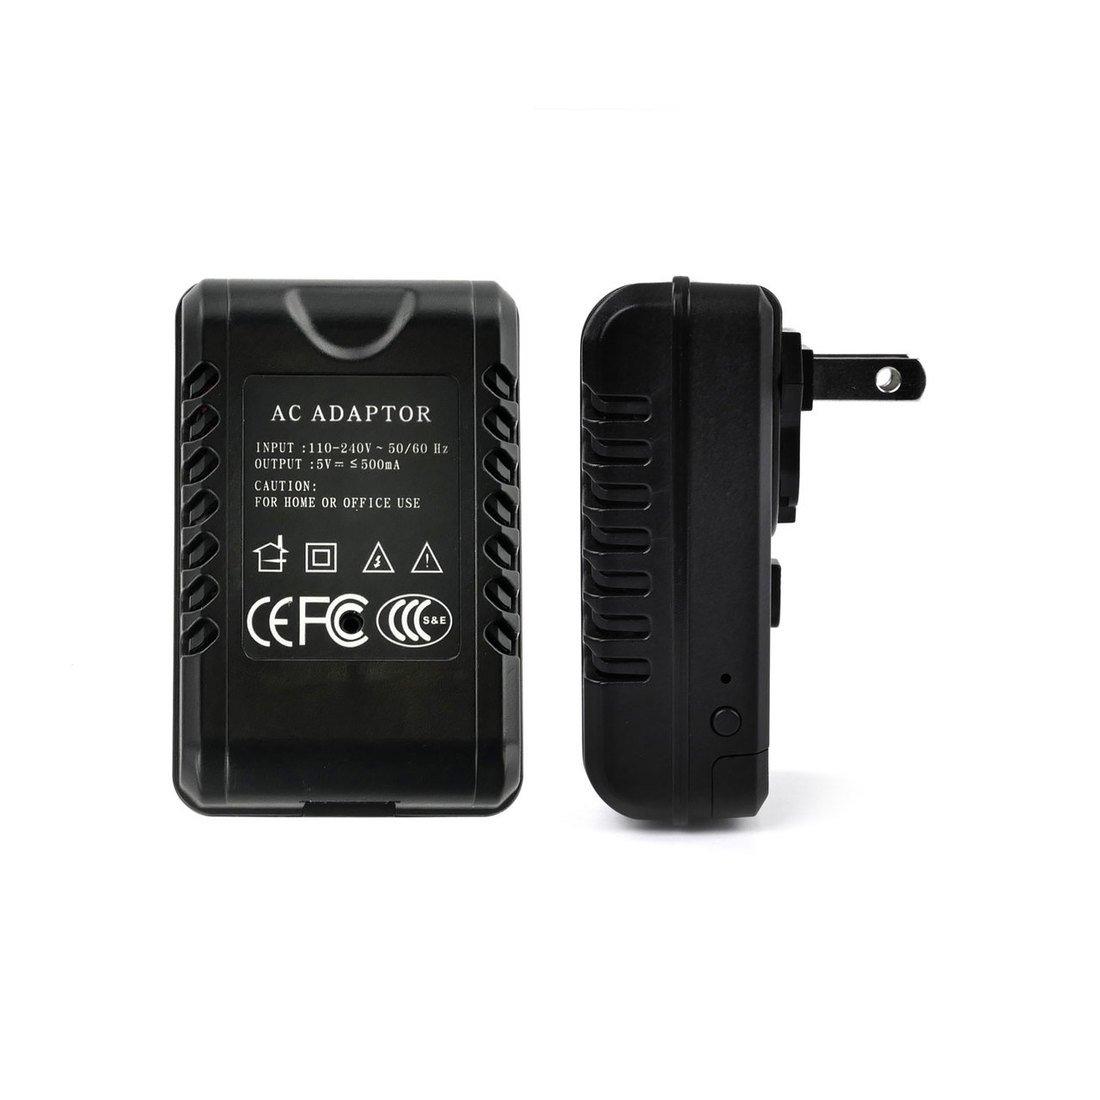 RecorderGear AC80 HD 1080P Hidden Camera AC Adapter / Motion Activated / 15° Upward Lens / Loop Recording / Covert Security Spy Nanny Cam